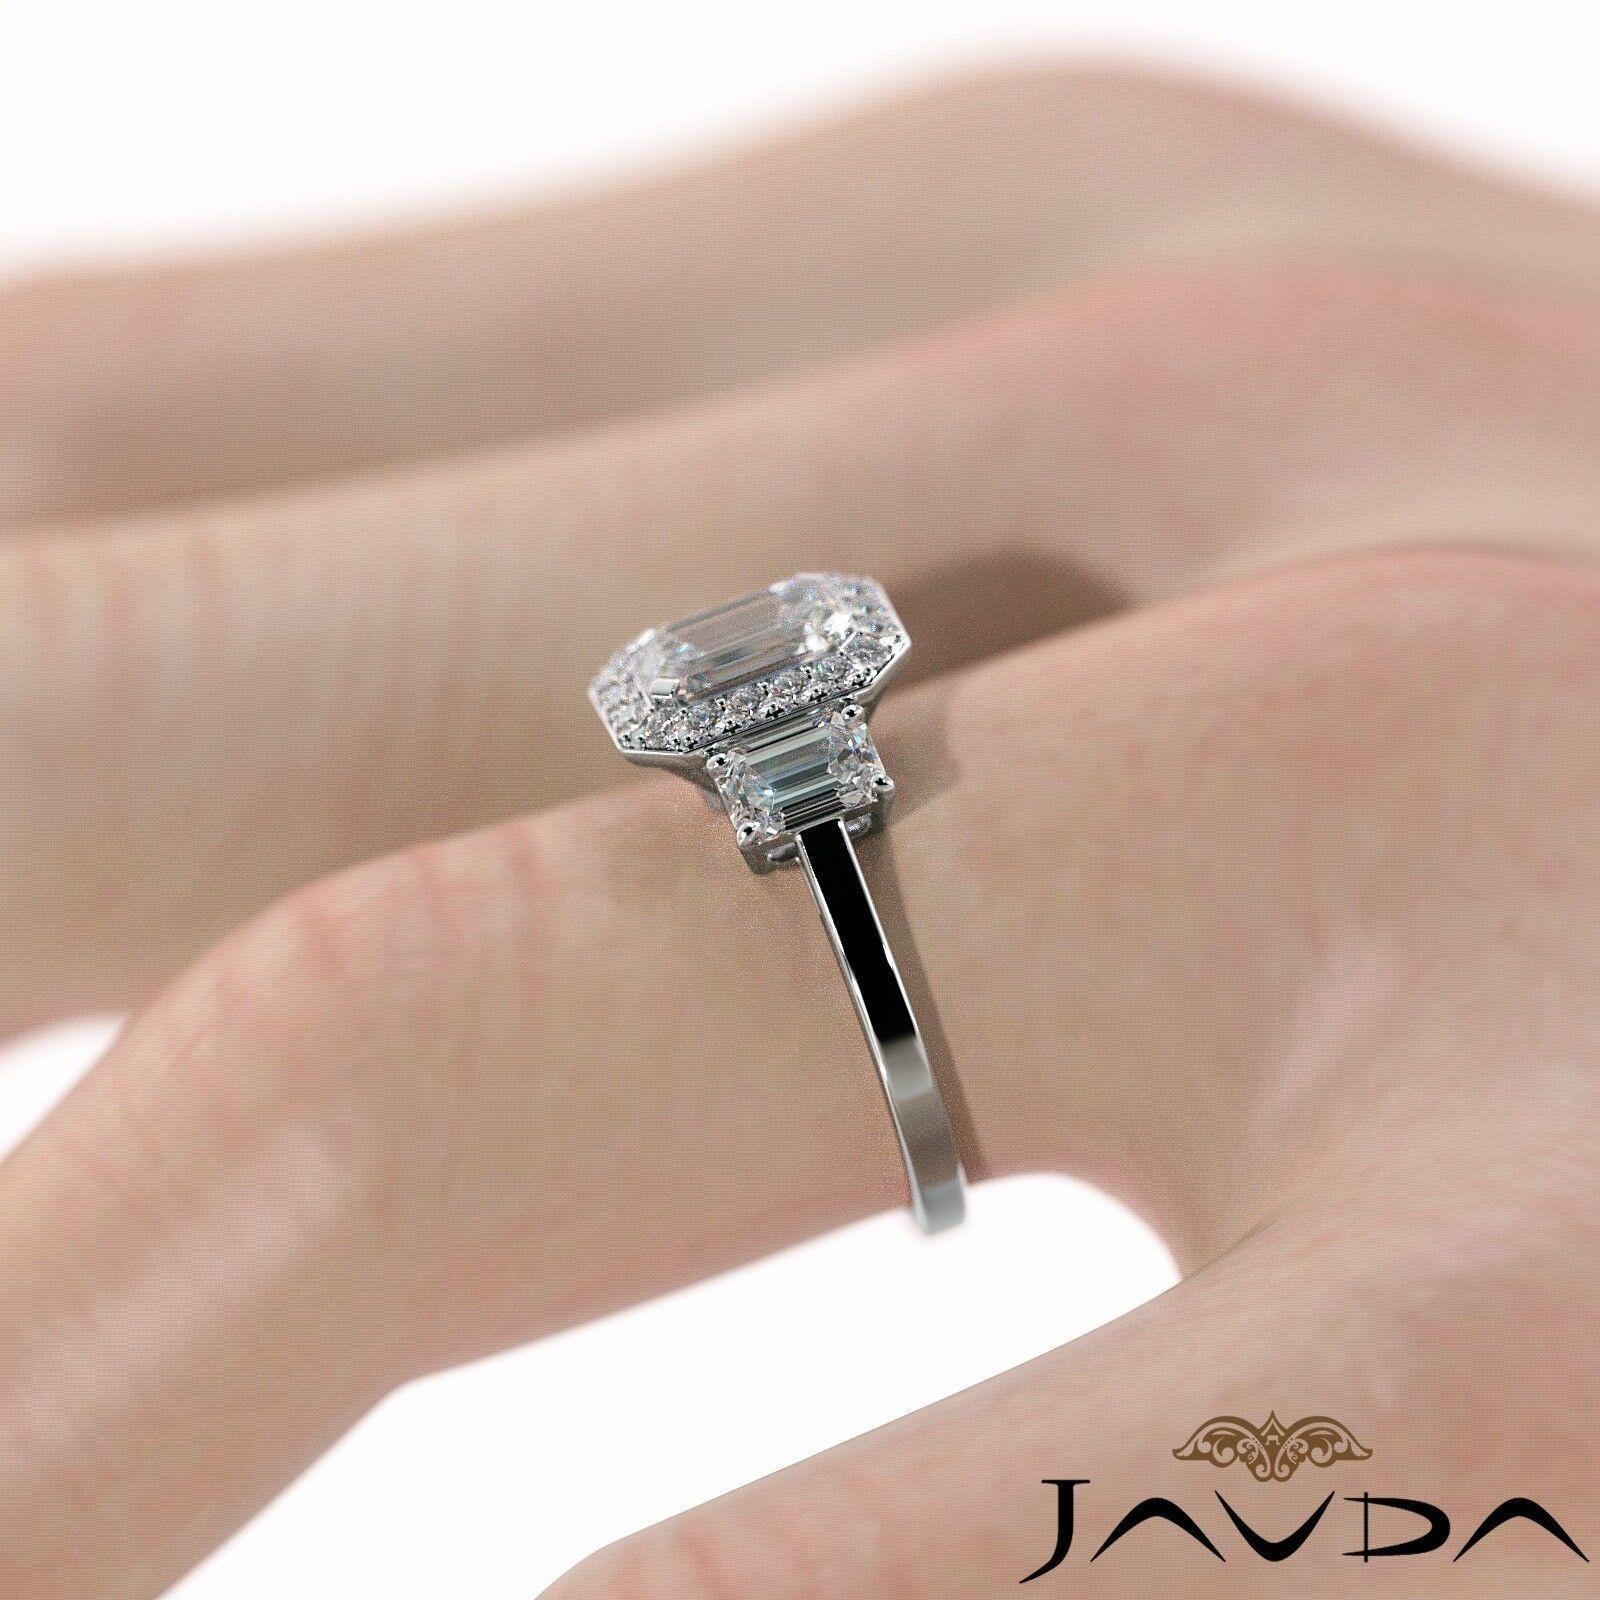 1.55ctw 3 Stone Halo Pave Emerald Diamond Engagement Ring GIA F-SI2 White Gold 5